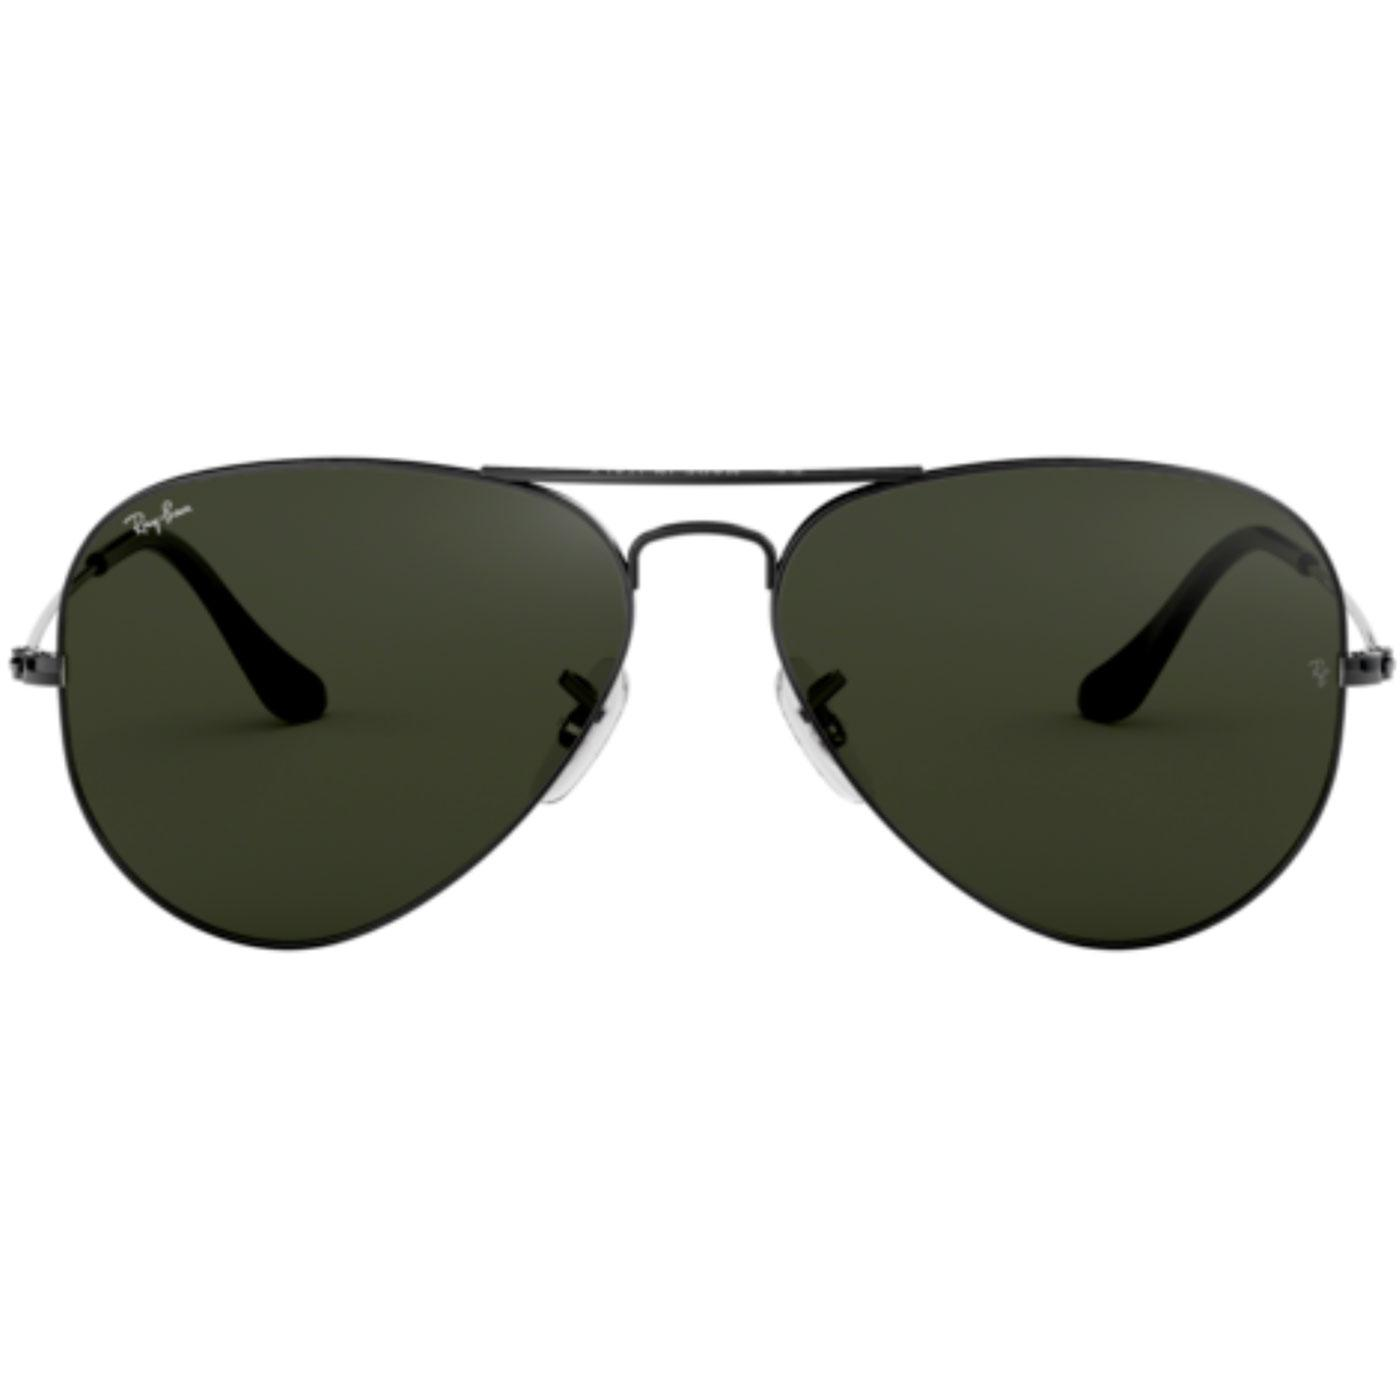 Ray-Ban Retro 60s Mod Aviator Indie Sunglasses GM